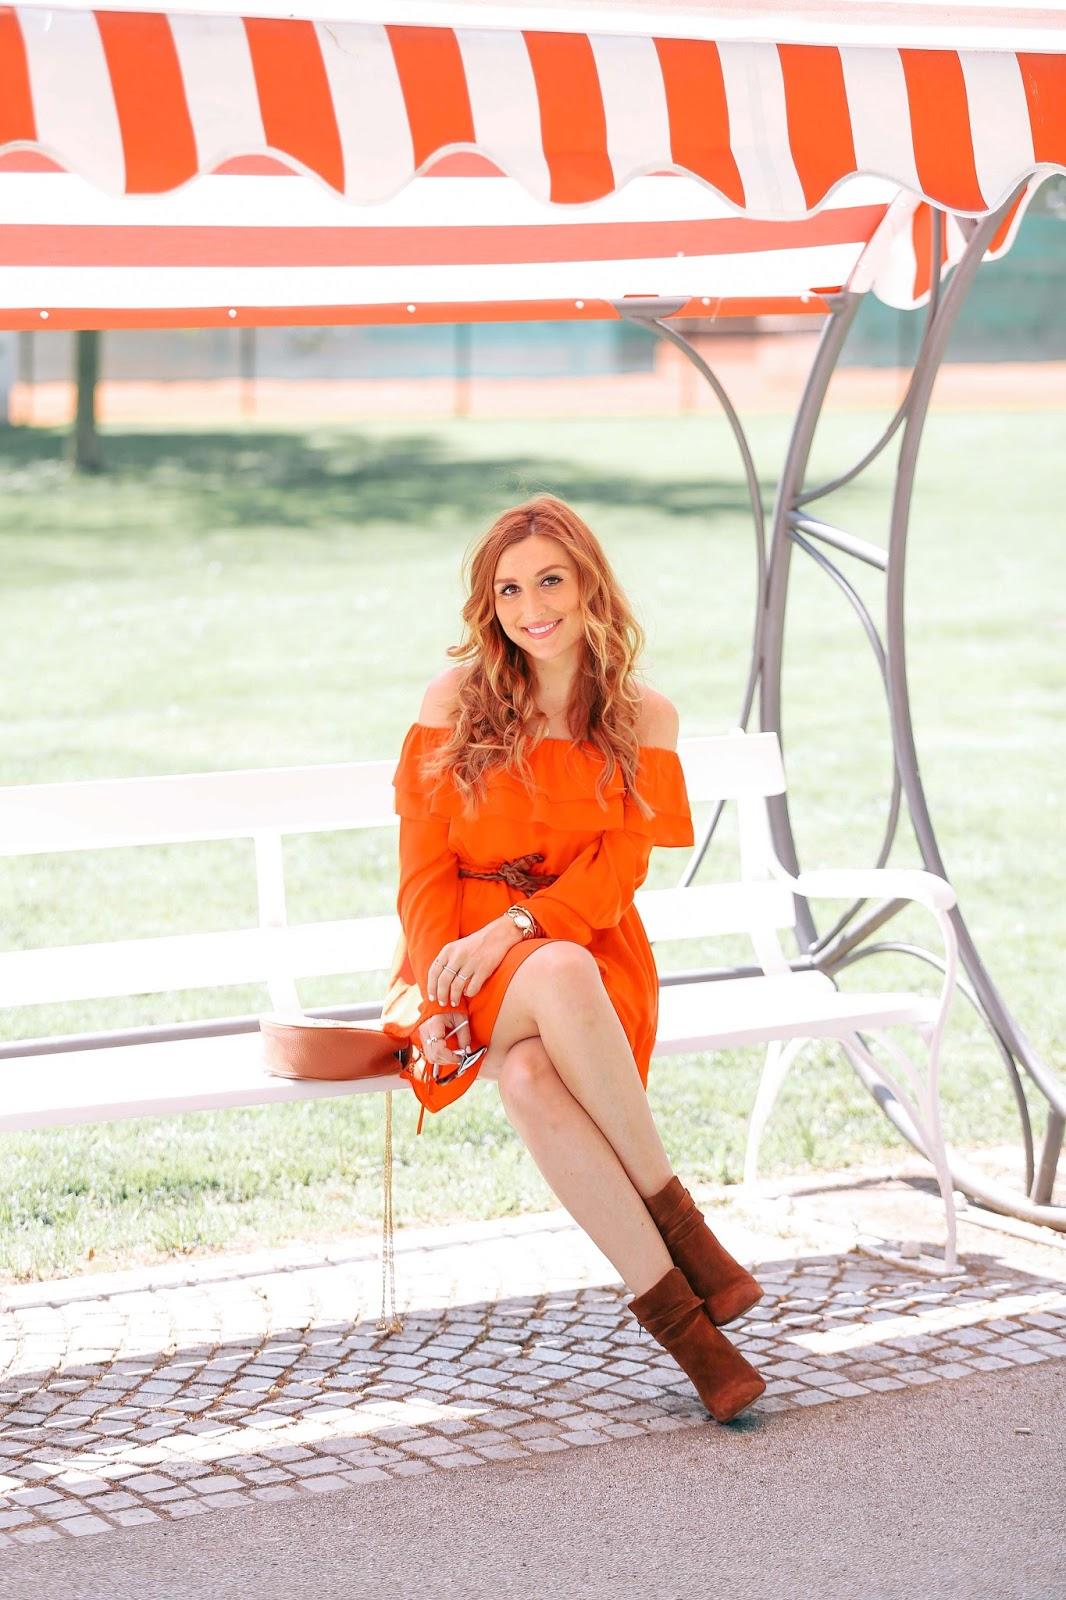 fashionstylebyjohanna-sommer-look-blogger-style-fashionblogger-aus-deutschland-fashionstylebyjohanna